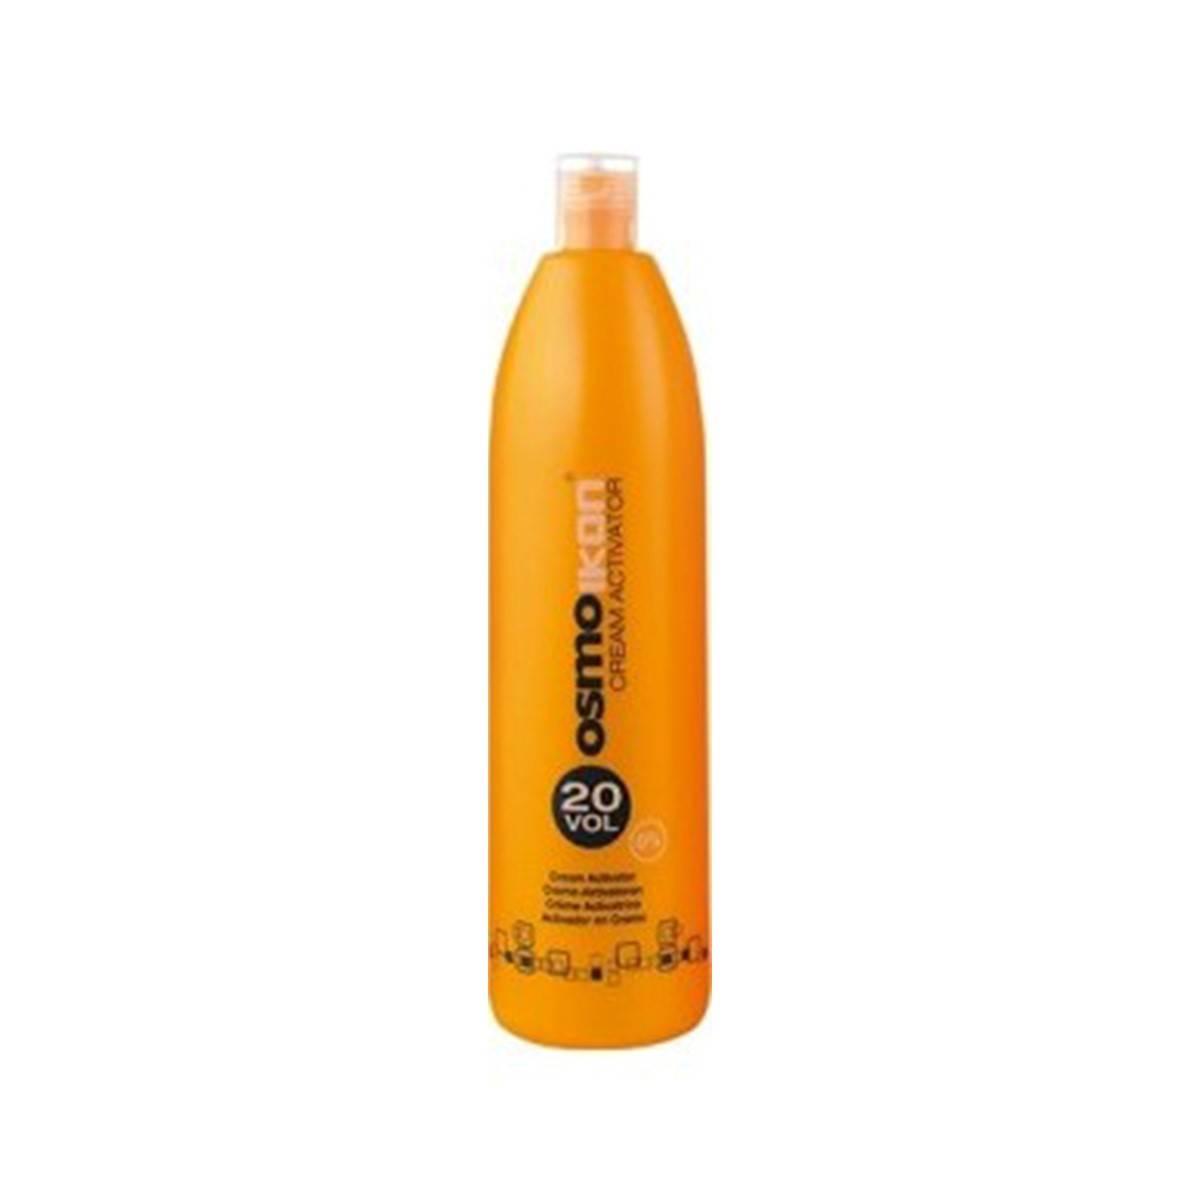 Osmo Ikon Cream Coact. 20 Vol Ossigeno 20 Vol